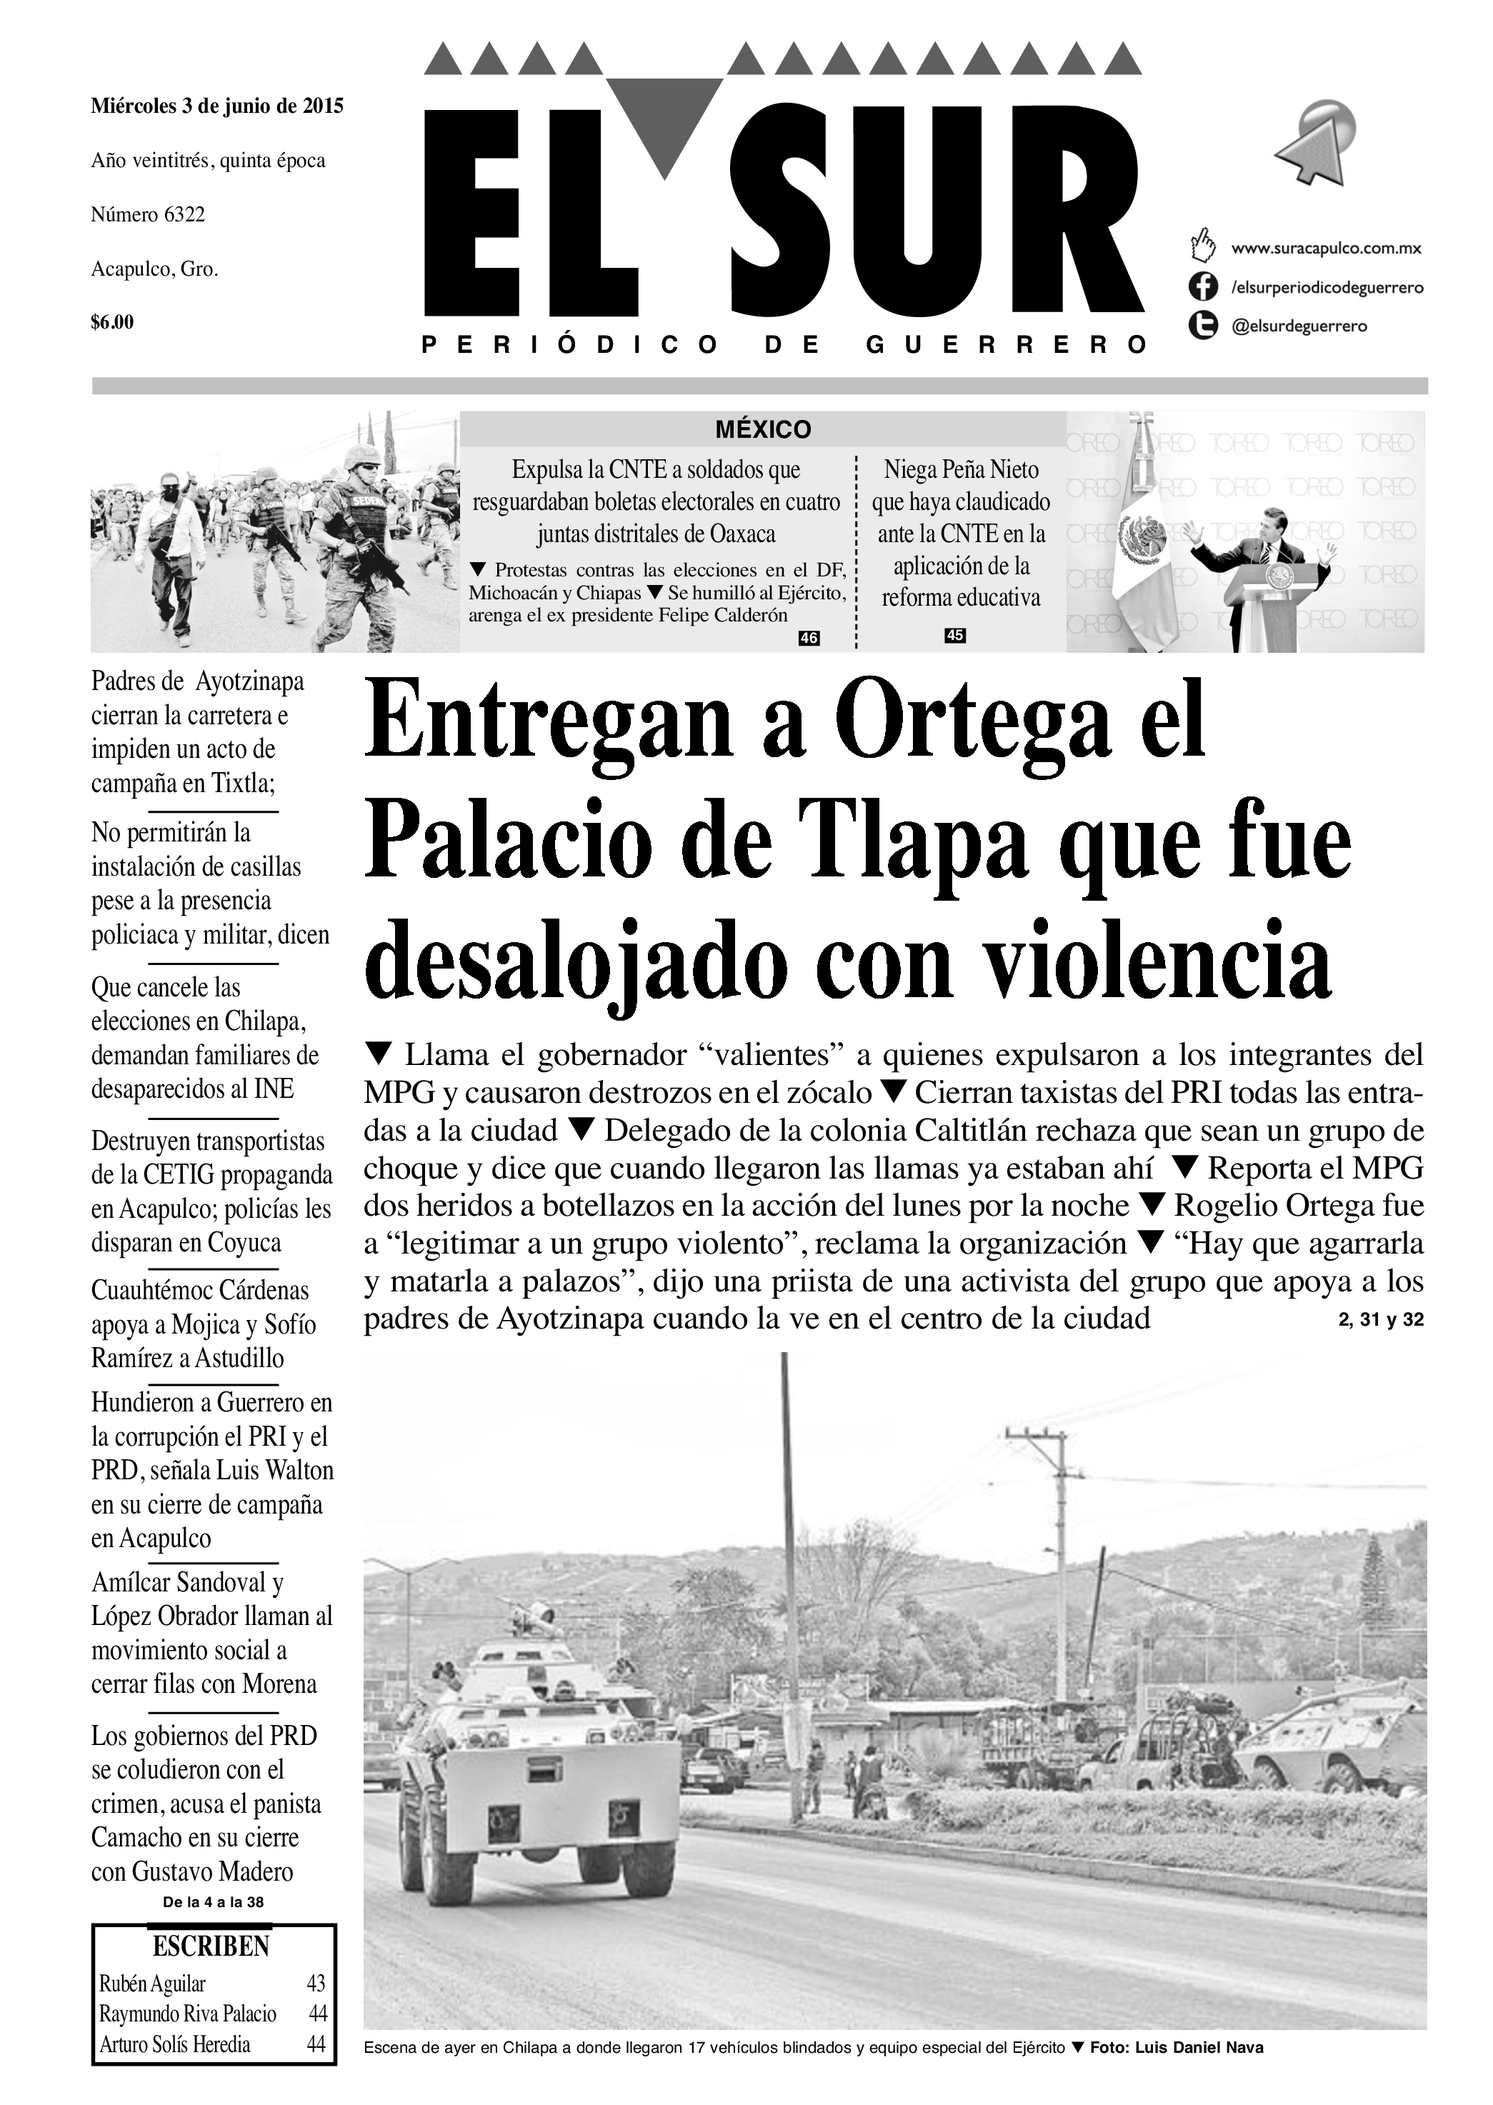 c5de602615 Calaméo - El Sur Miercoles 03062015